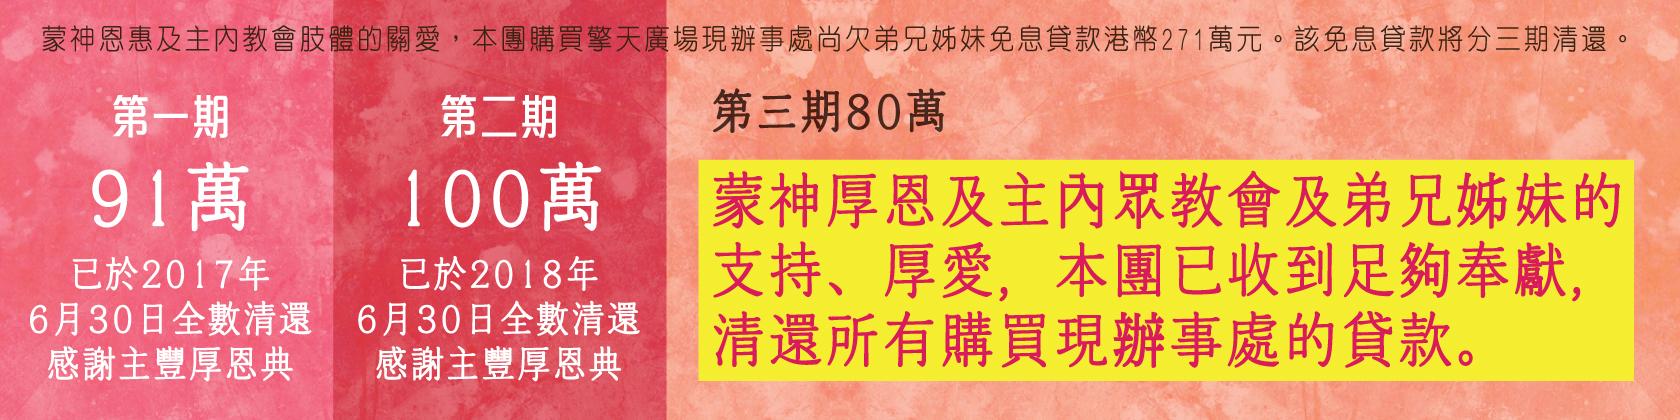 CB-02-web-banner-1680-x-420-03-4